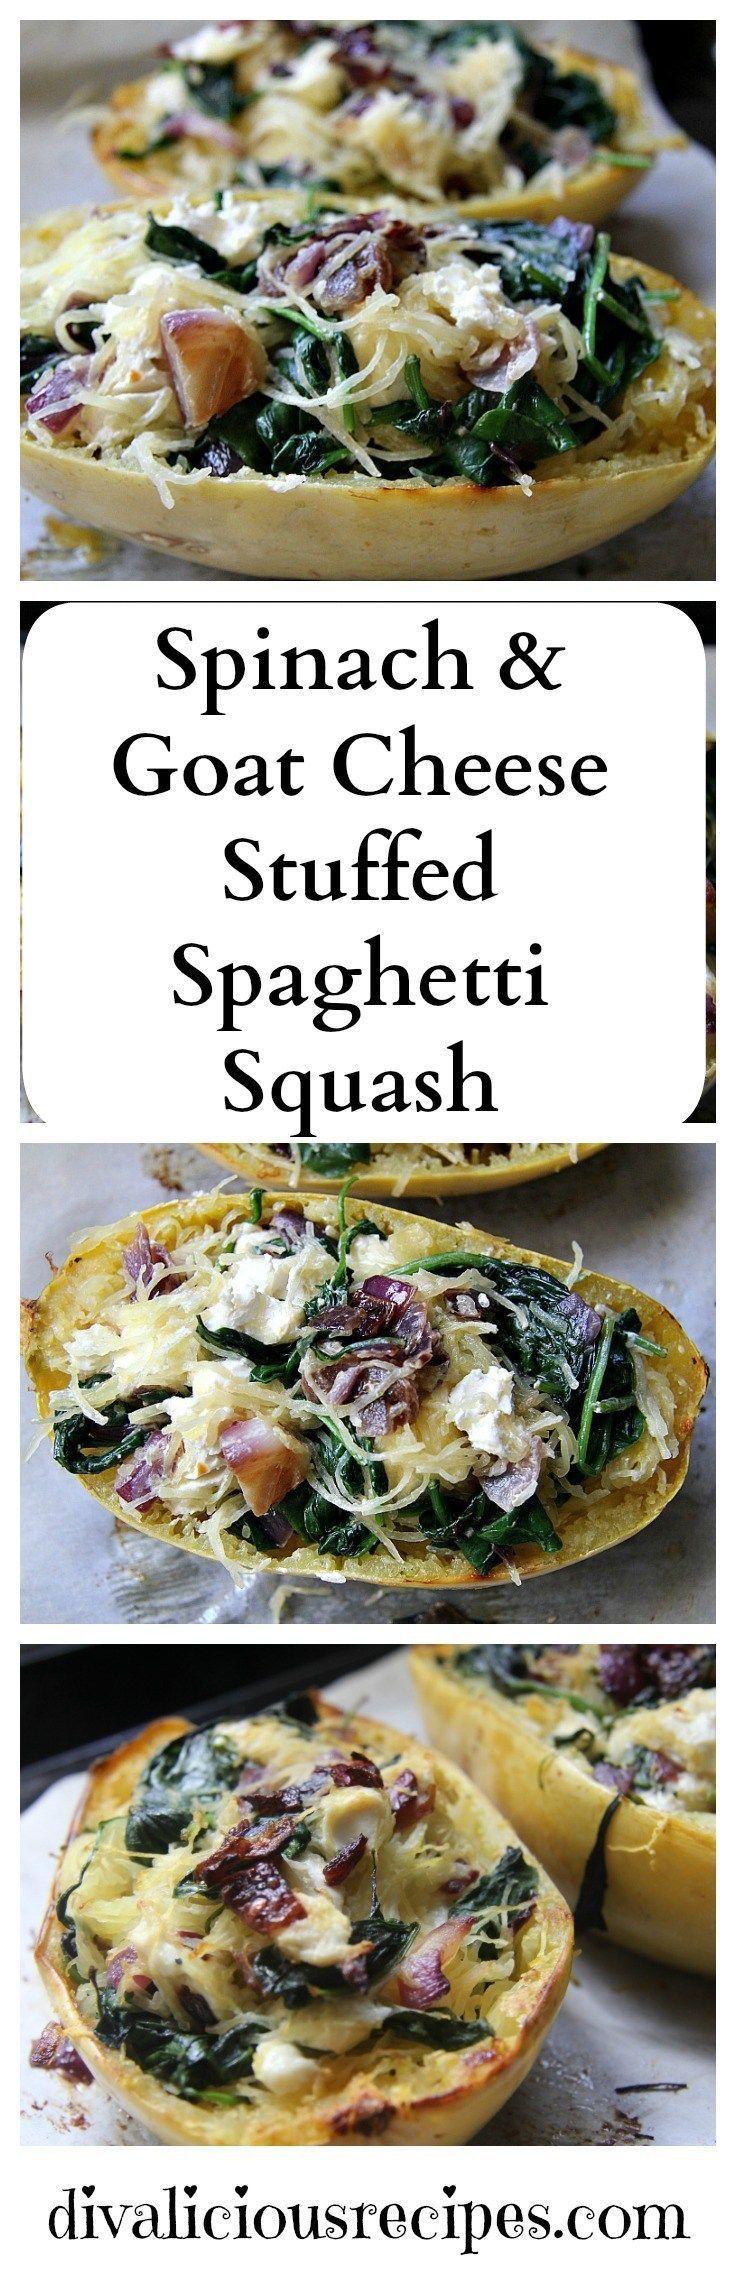 Photo of Spinach & Goat Cheese Stuffed Spaghetti Squash #vegetariandish This stuffed spag…